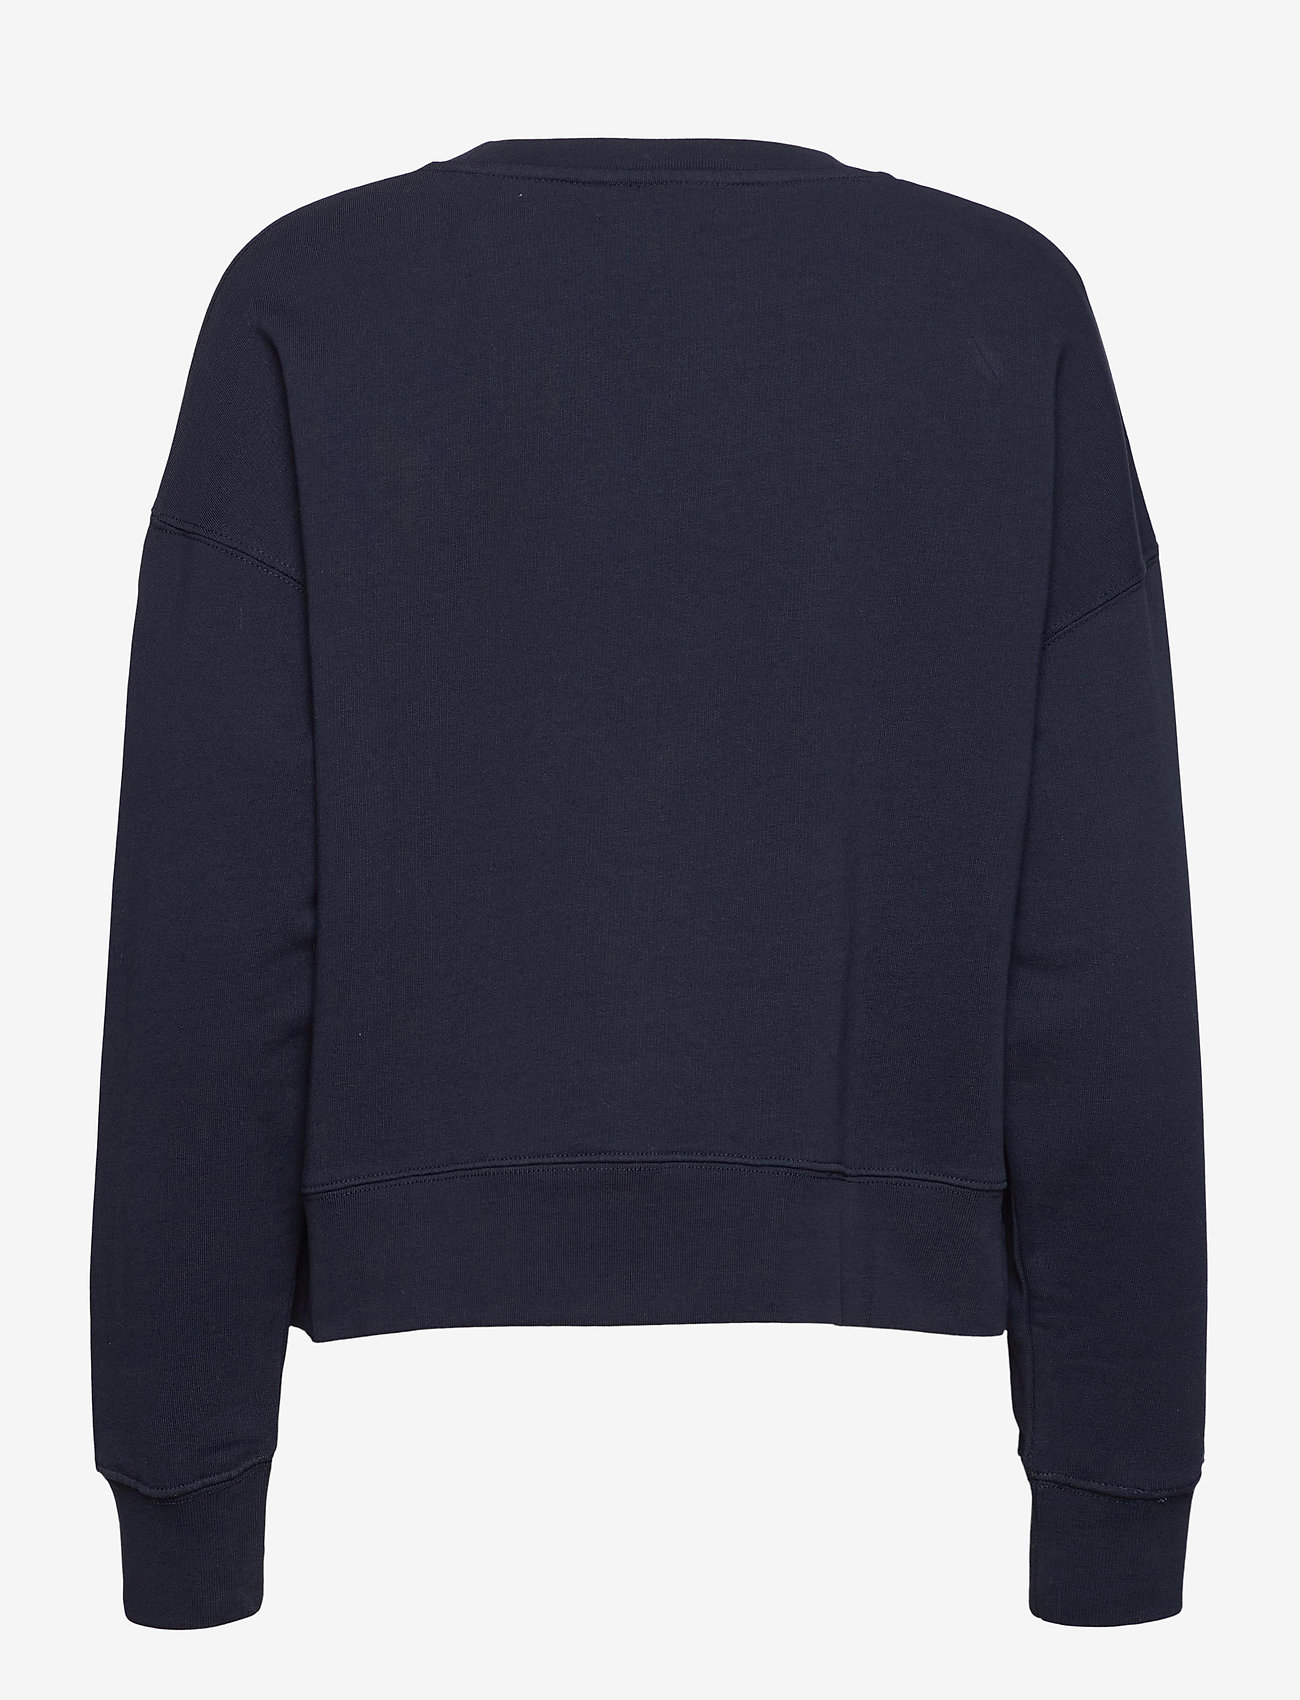 Zadig & Voltaire - CHAMP BLASON PRINTED CO/ MODAL SWEATSHIRT - sweatshirts & hættetrøjer - encre - 2